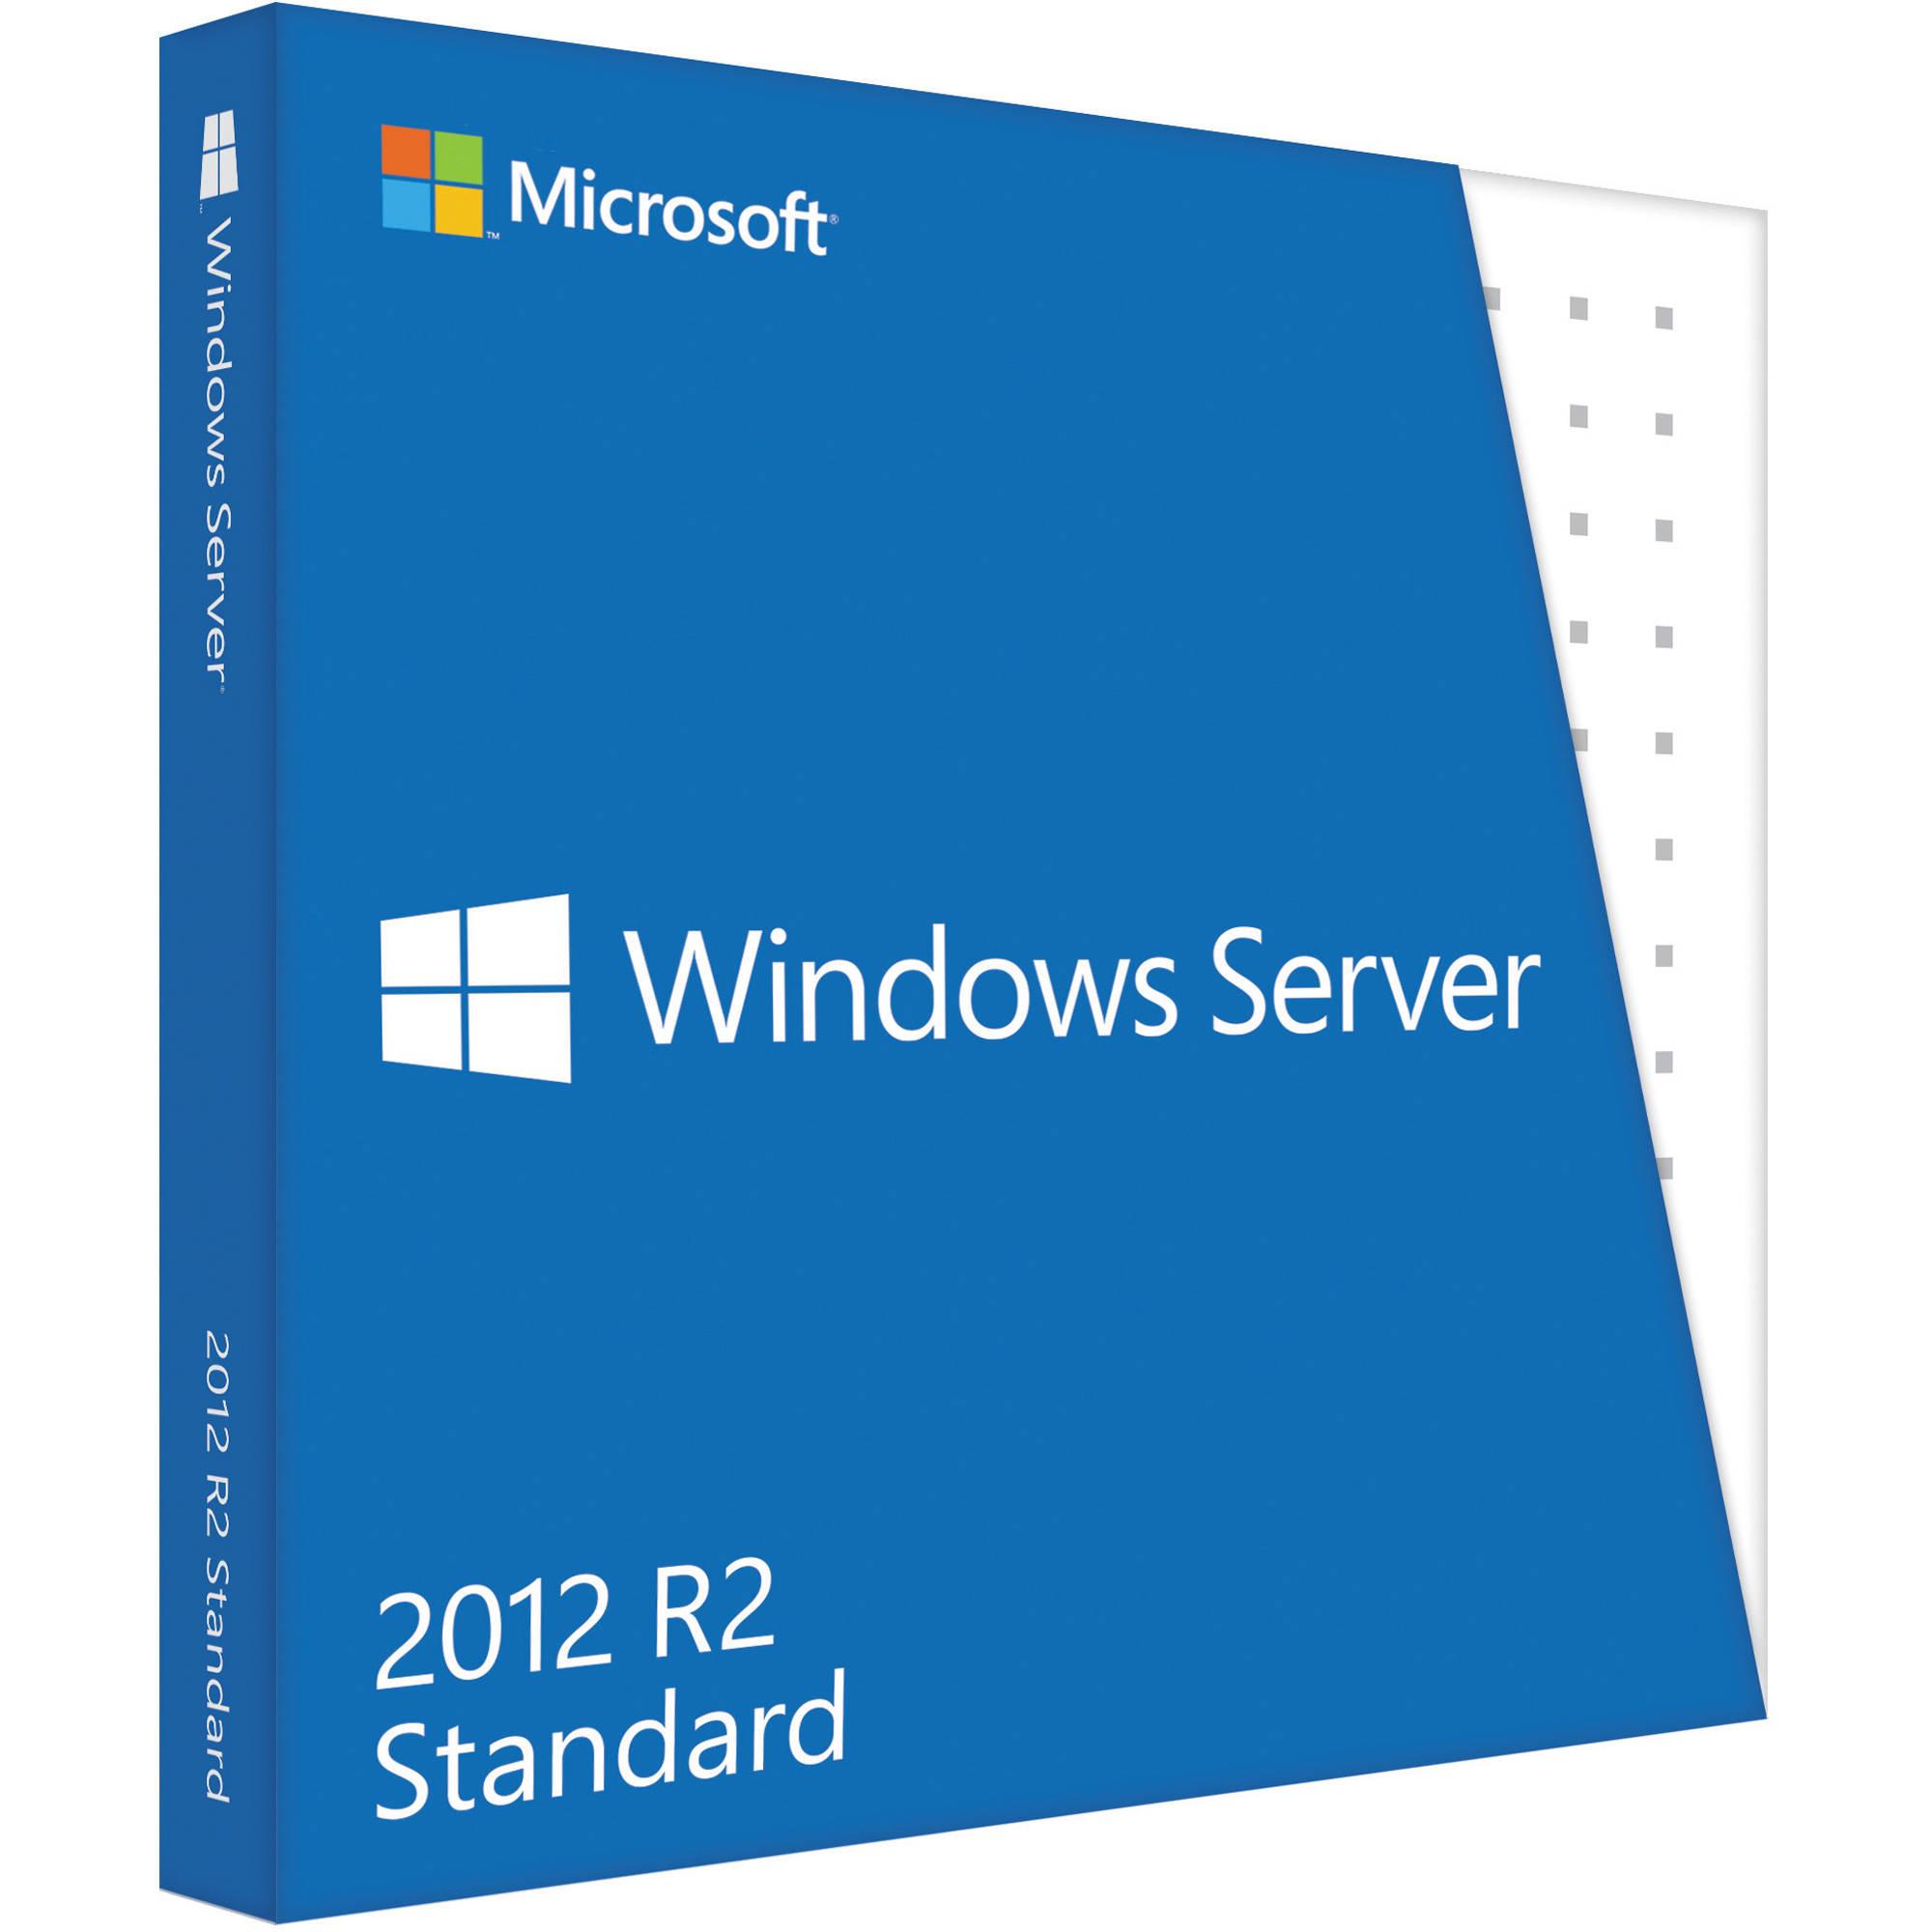 Licencia Windows Server 2012 R2